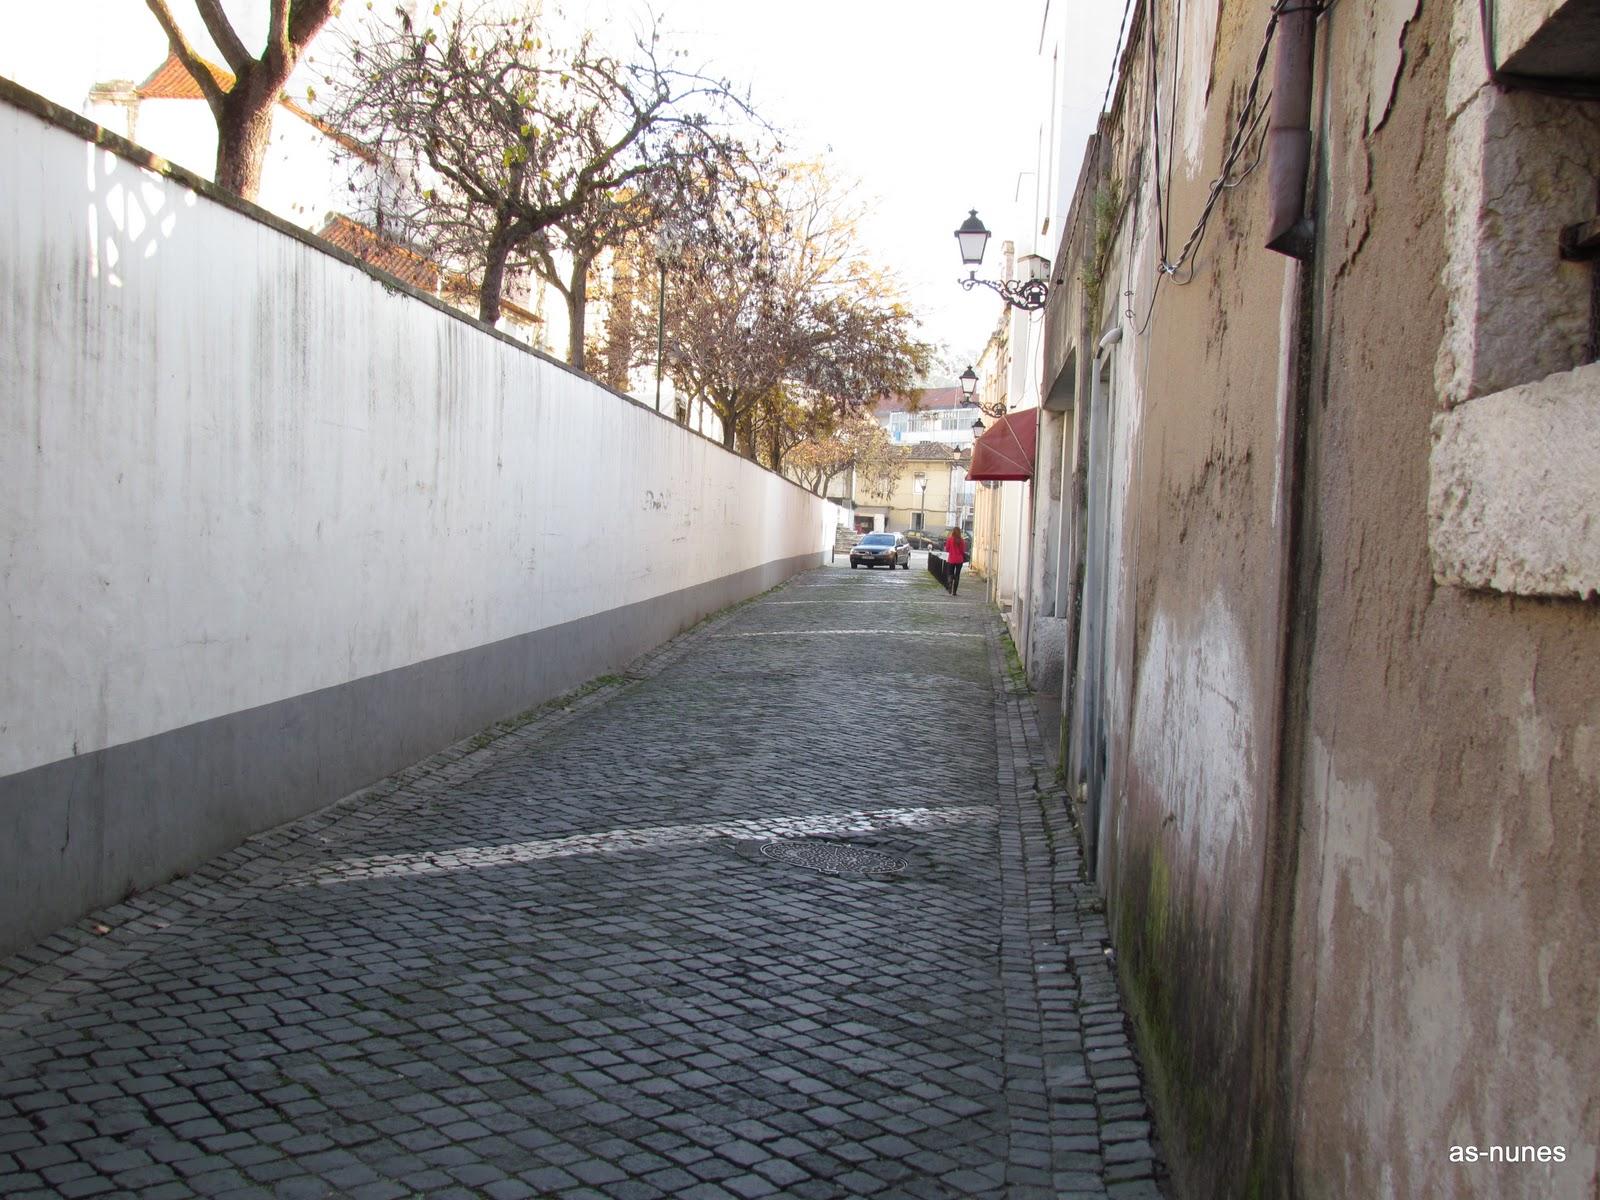 rua 69 leiria portuguesas a foder